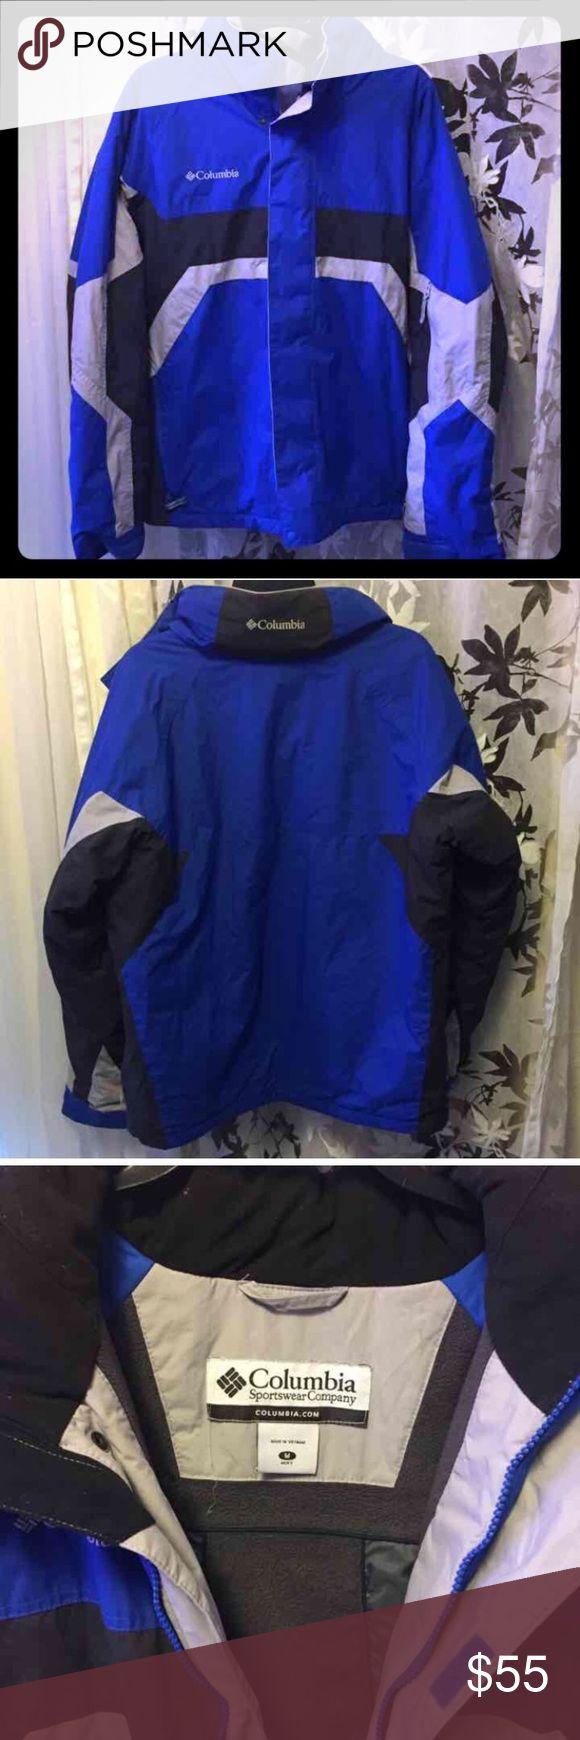 Men's Columbia Outdoor Jacket Warm coat jacket with lining and roll up hood. Like new but no tags. Columbia Jackets & Coats Raincoats